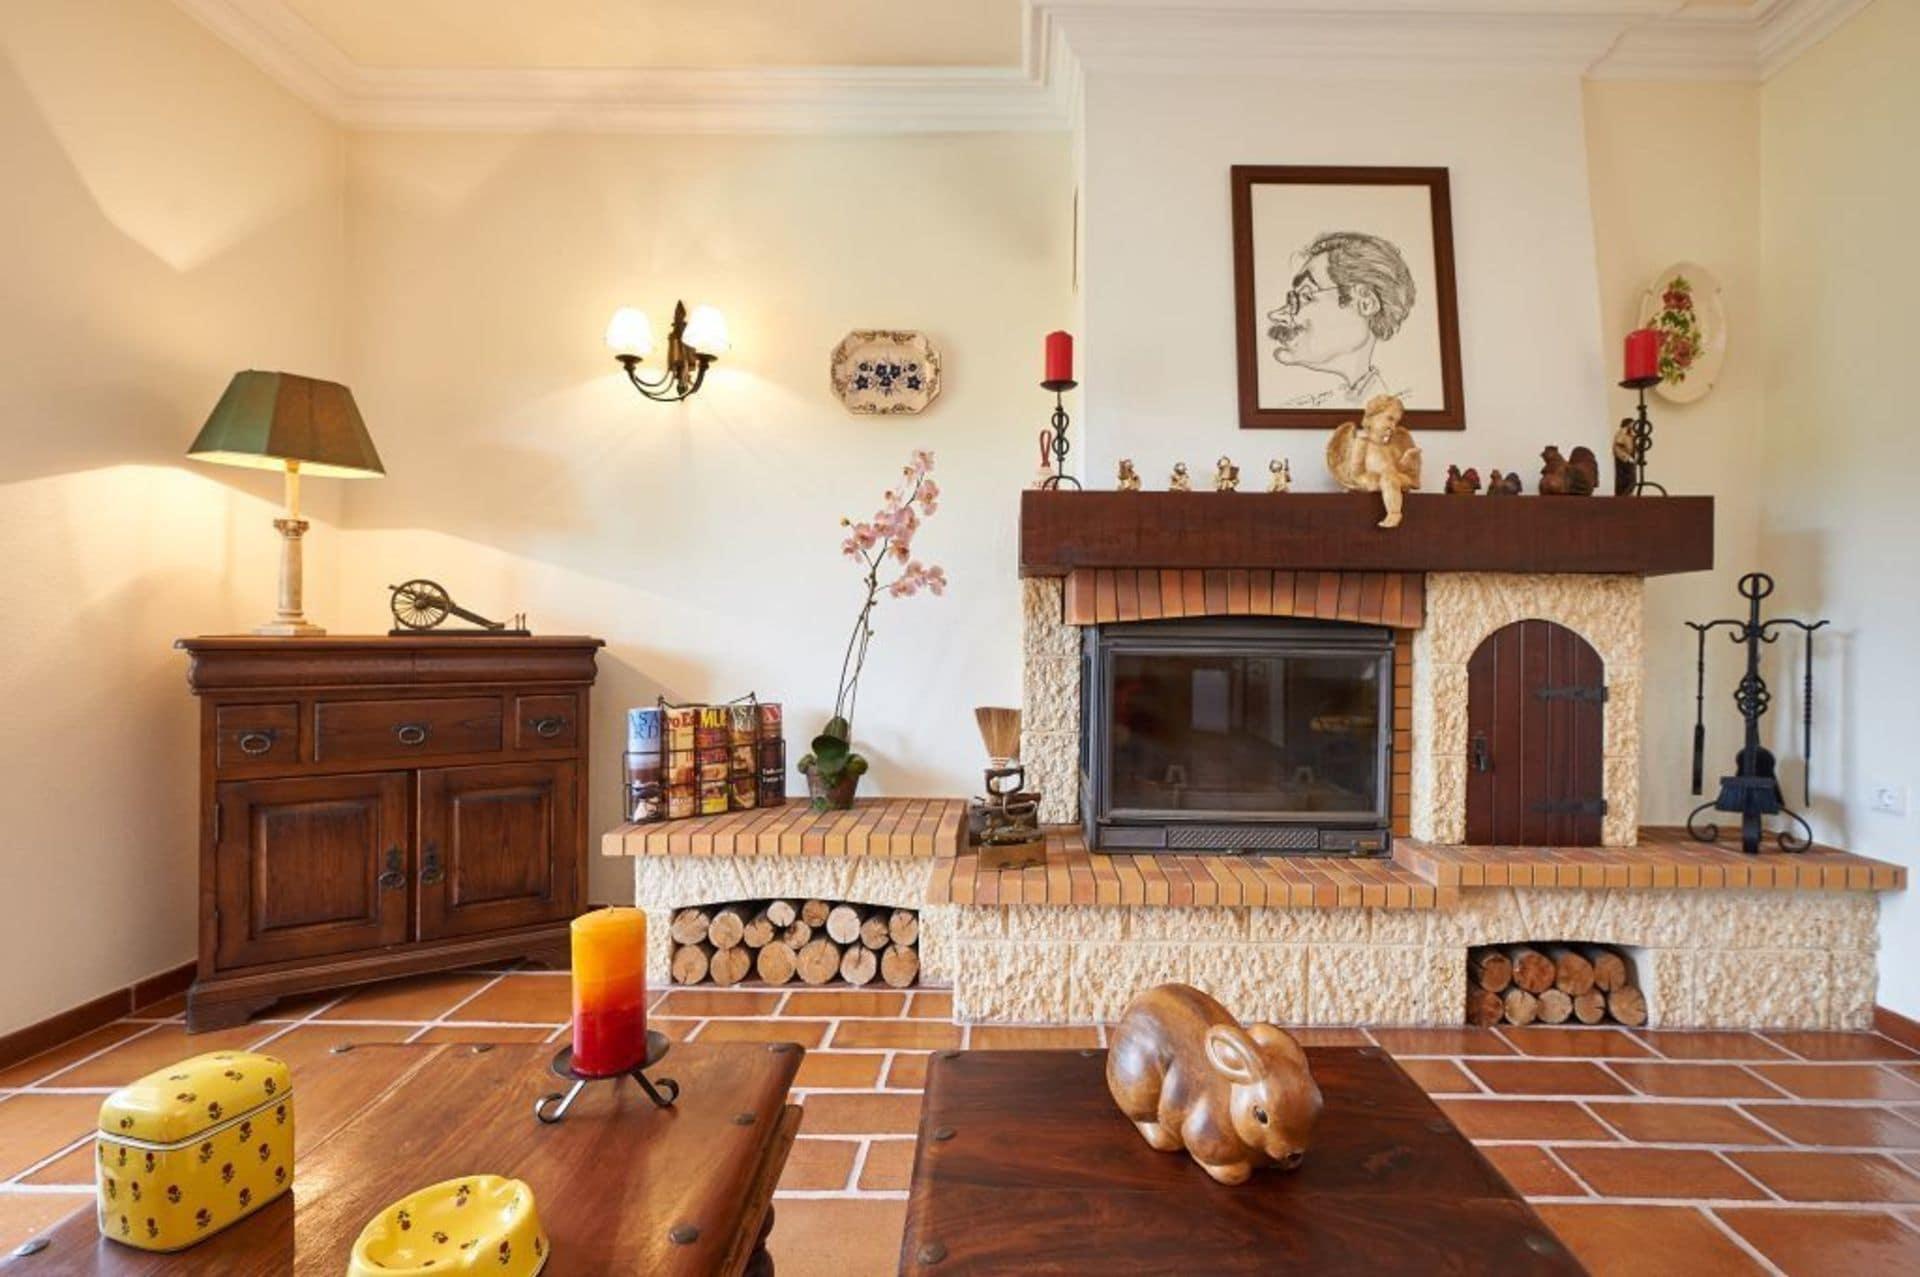 Casa-das-lampas, Sintra